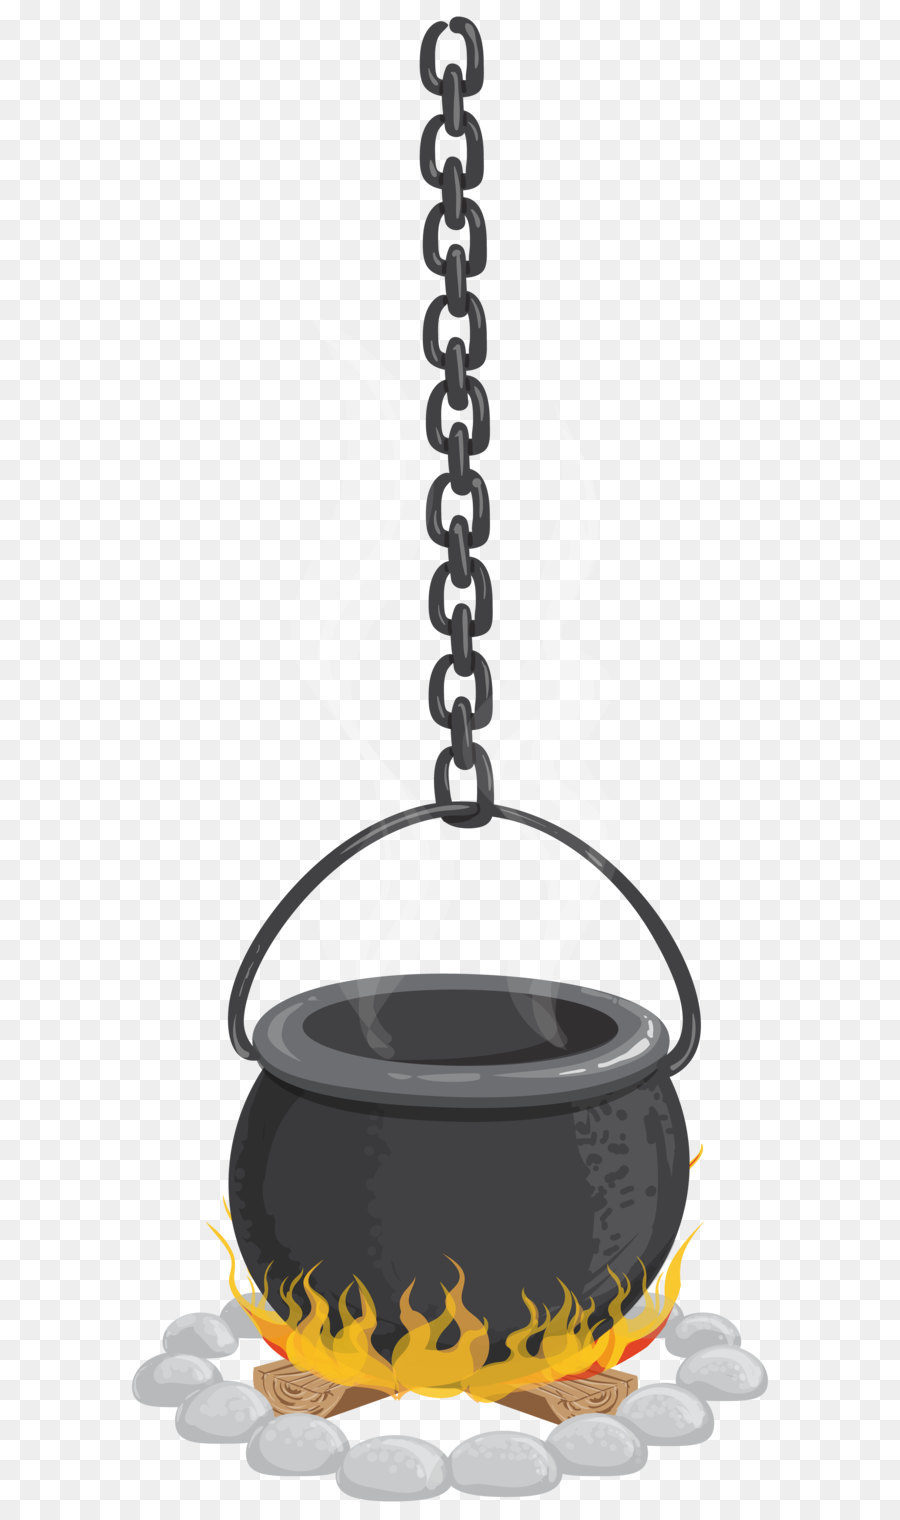 cauldron halloween clip art - hanging witch cauldron png transparent